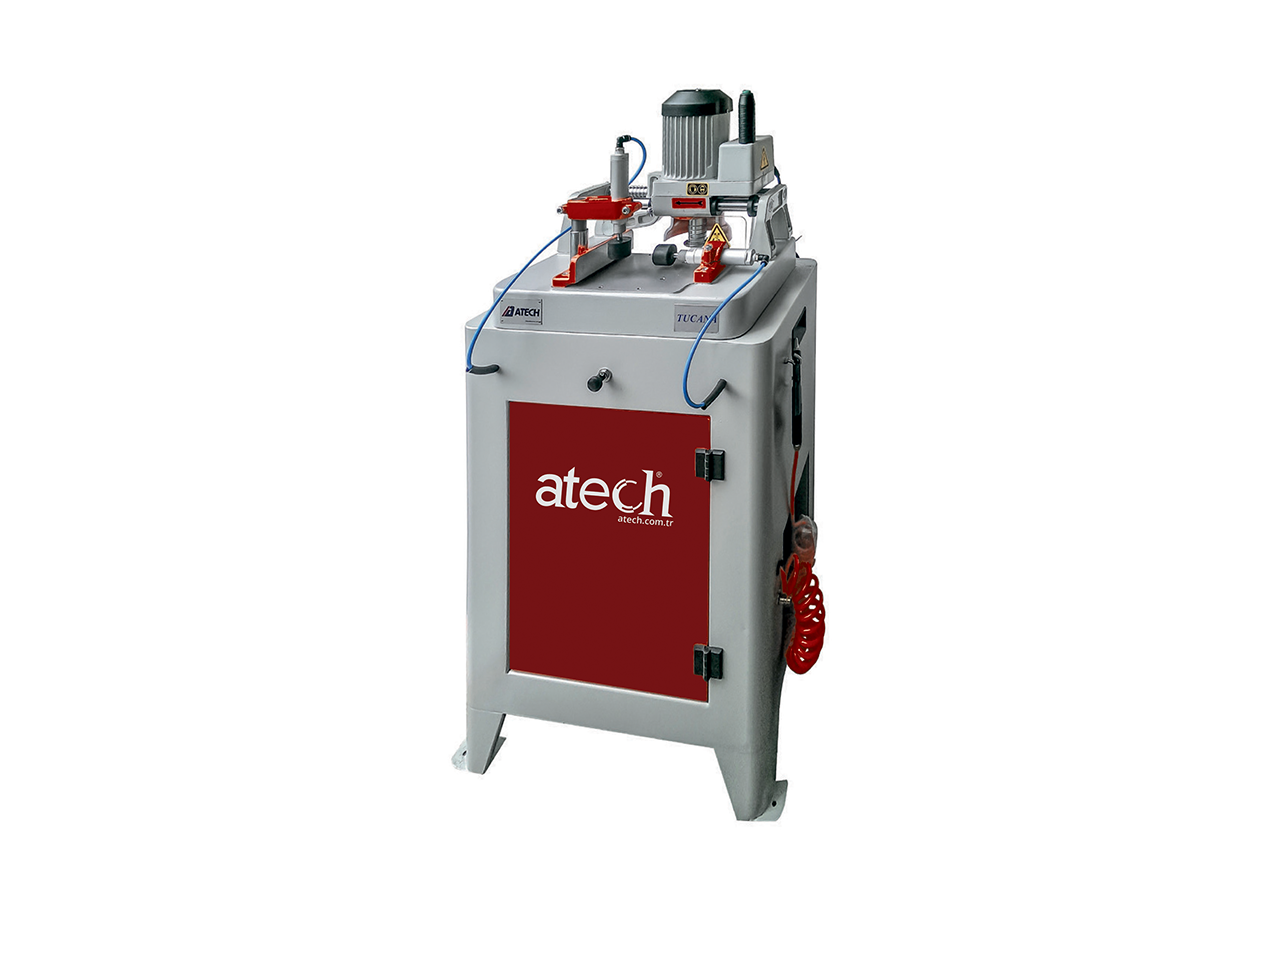 Tucana-3 End Milling Machine